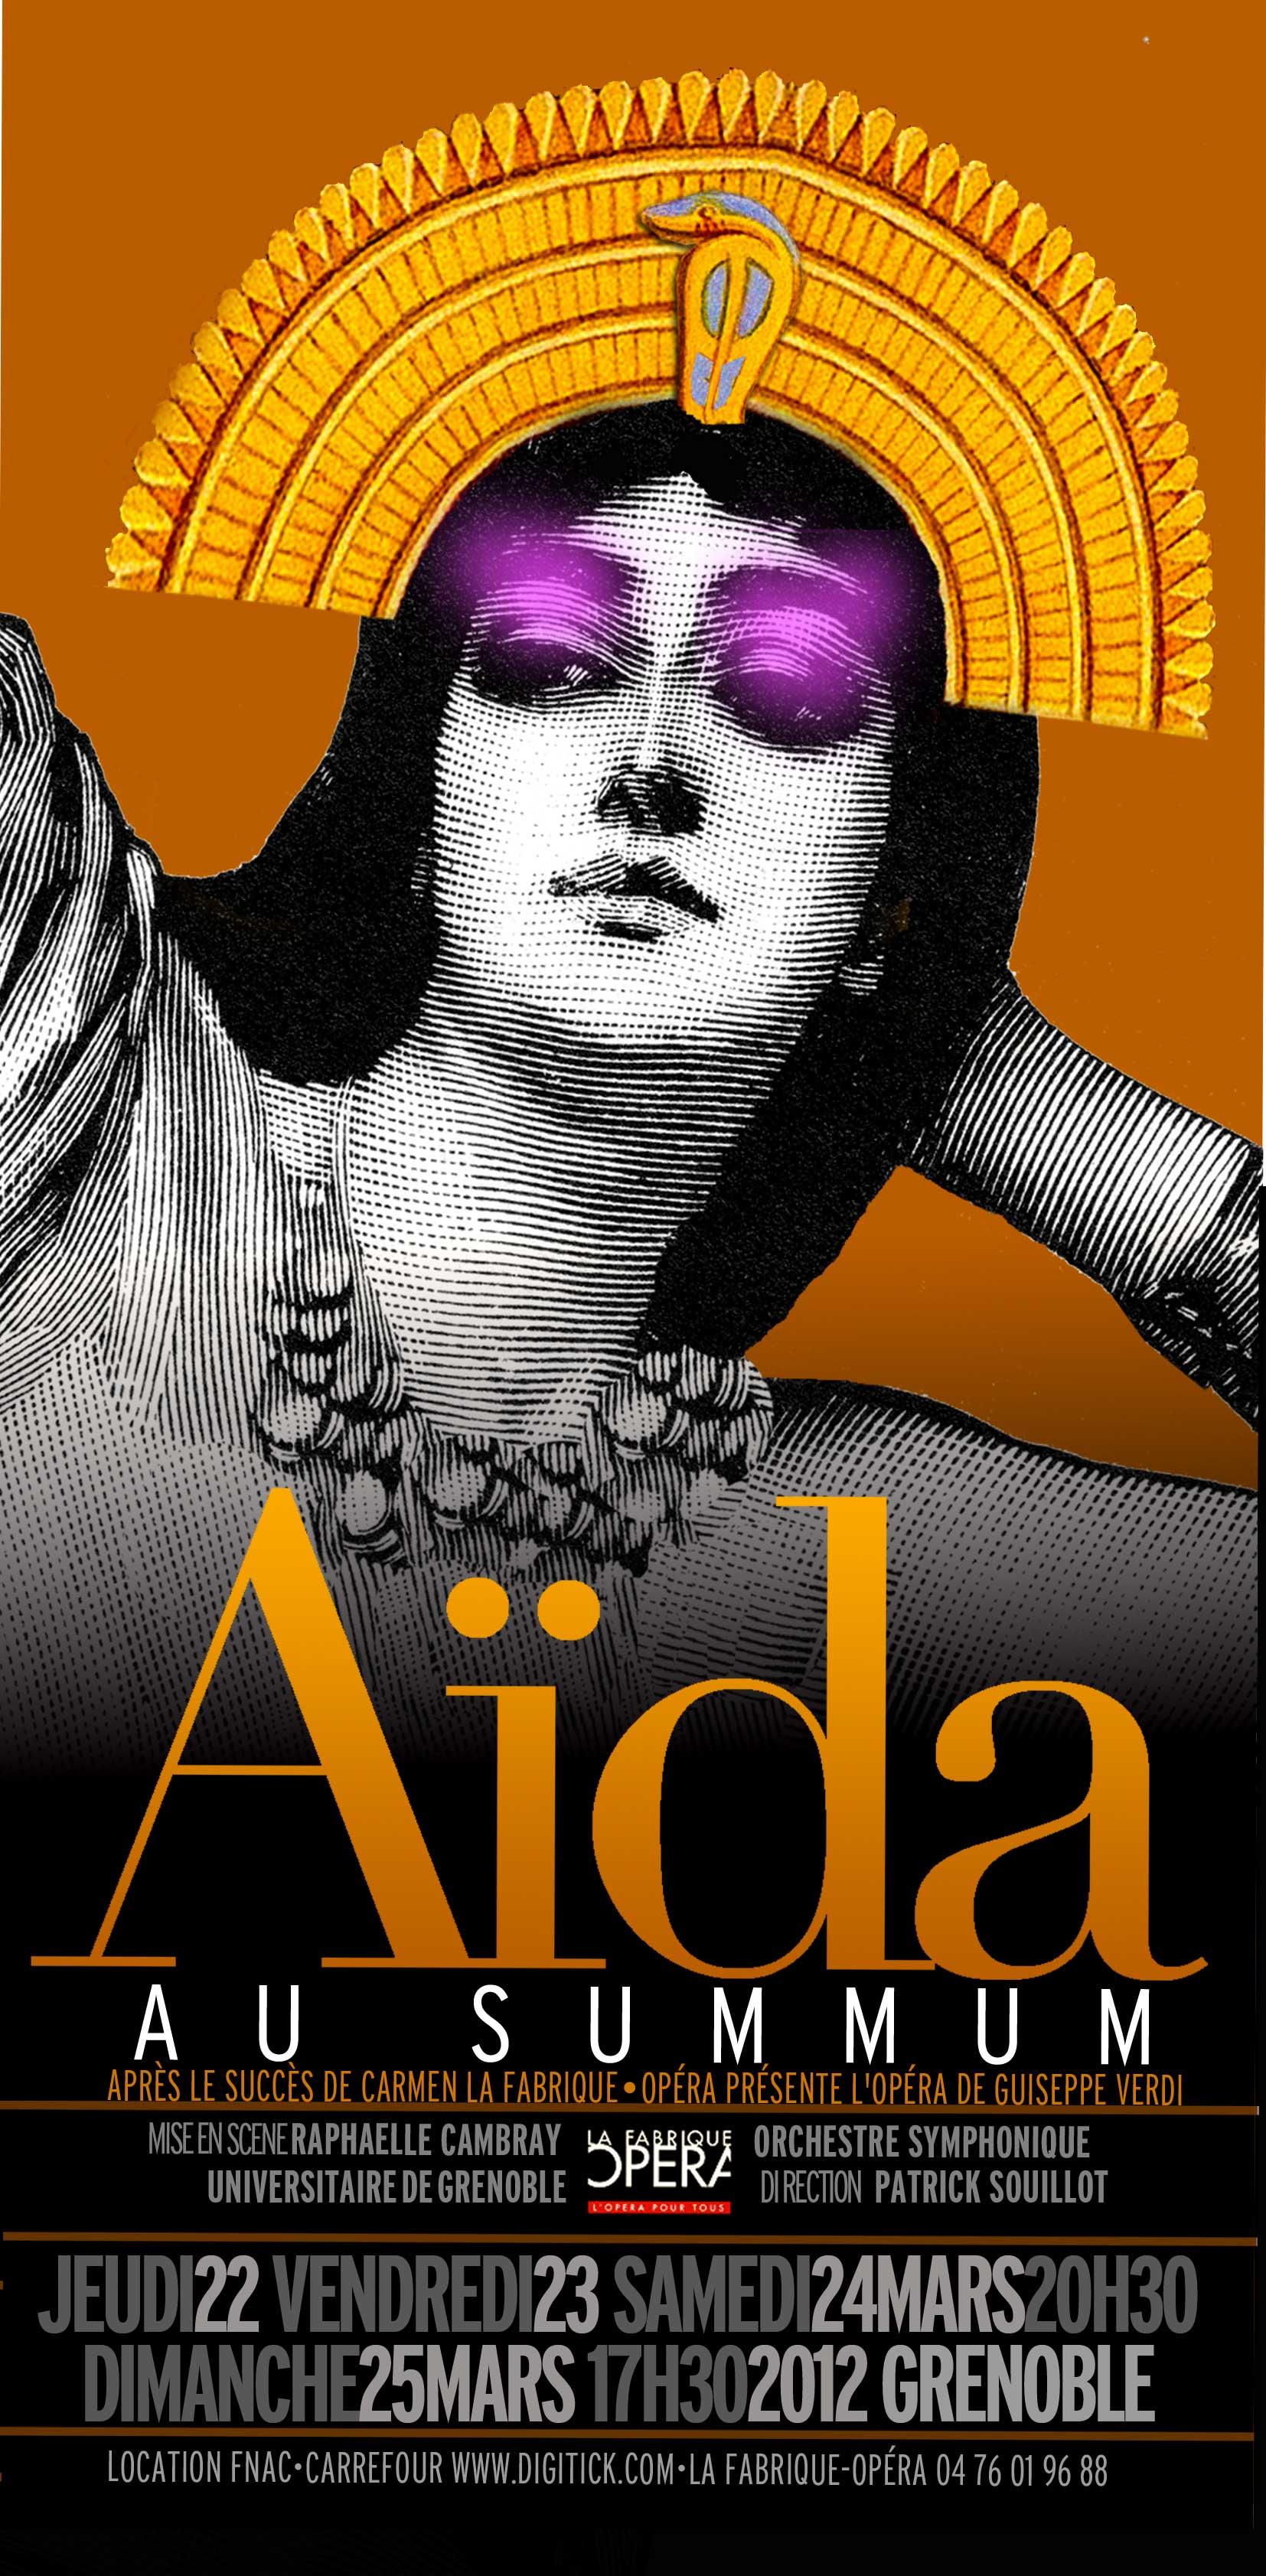 ZARAffiche-Aida